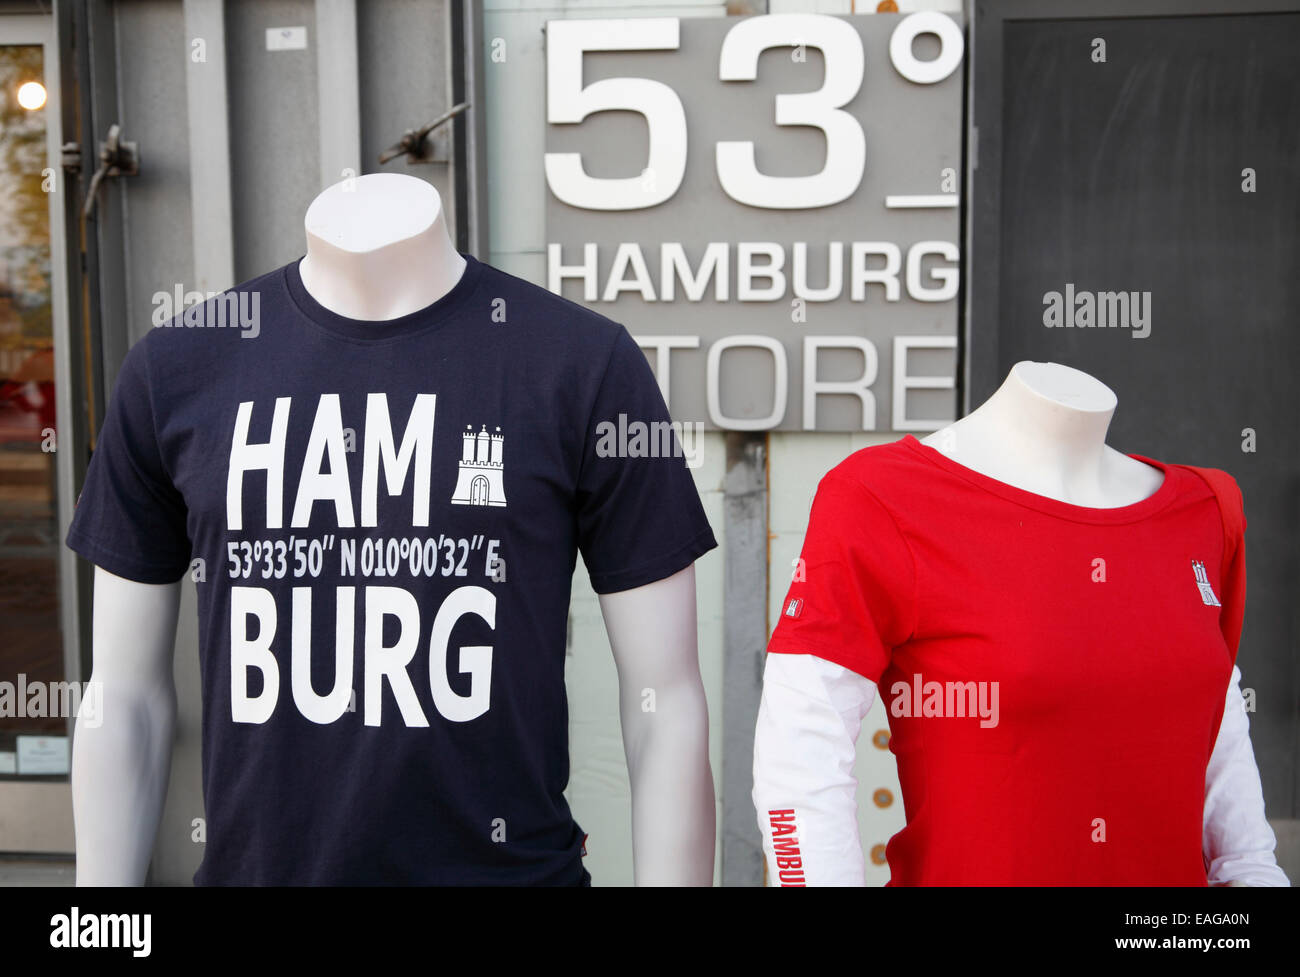 Souvenirshop at Hafencity, Hamburg, Germany, Europe - Stock Image